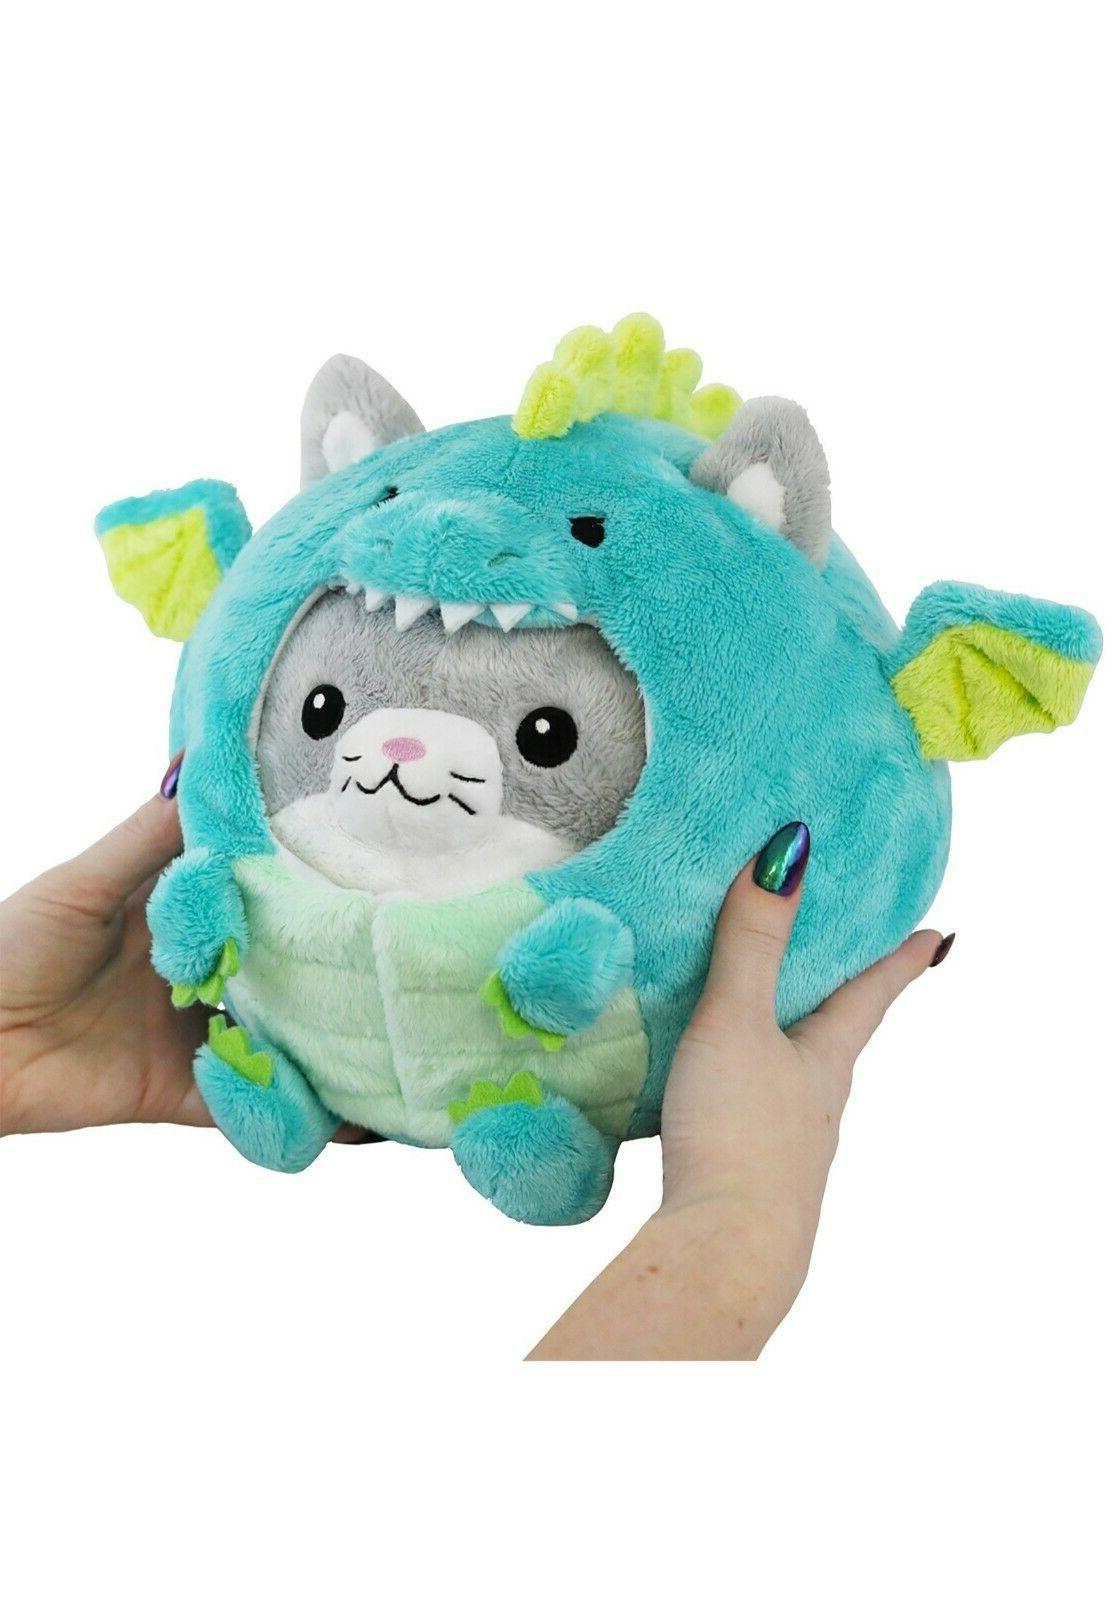 undercover stuffed animal kitty in dragon costume